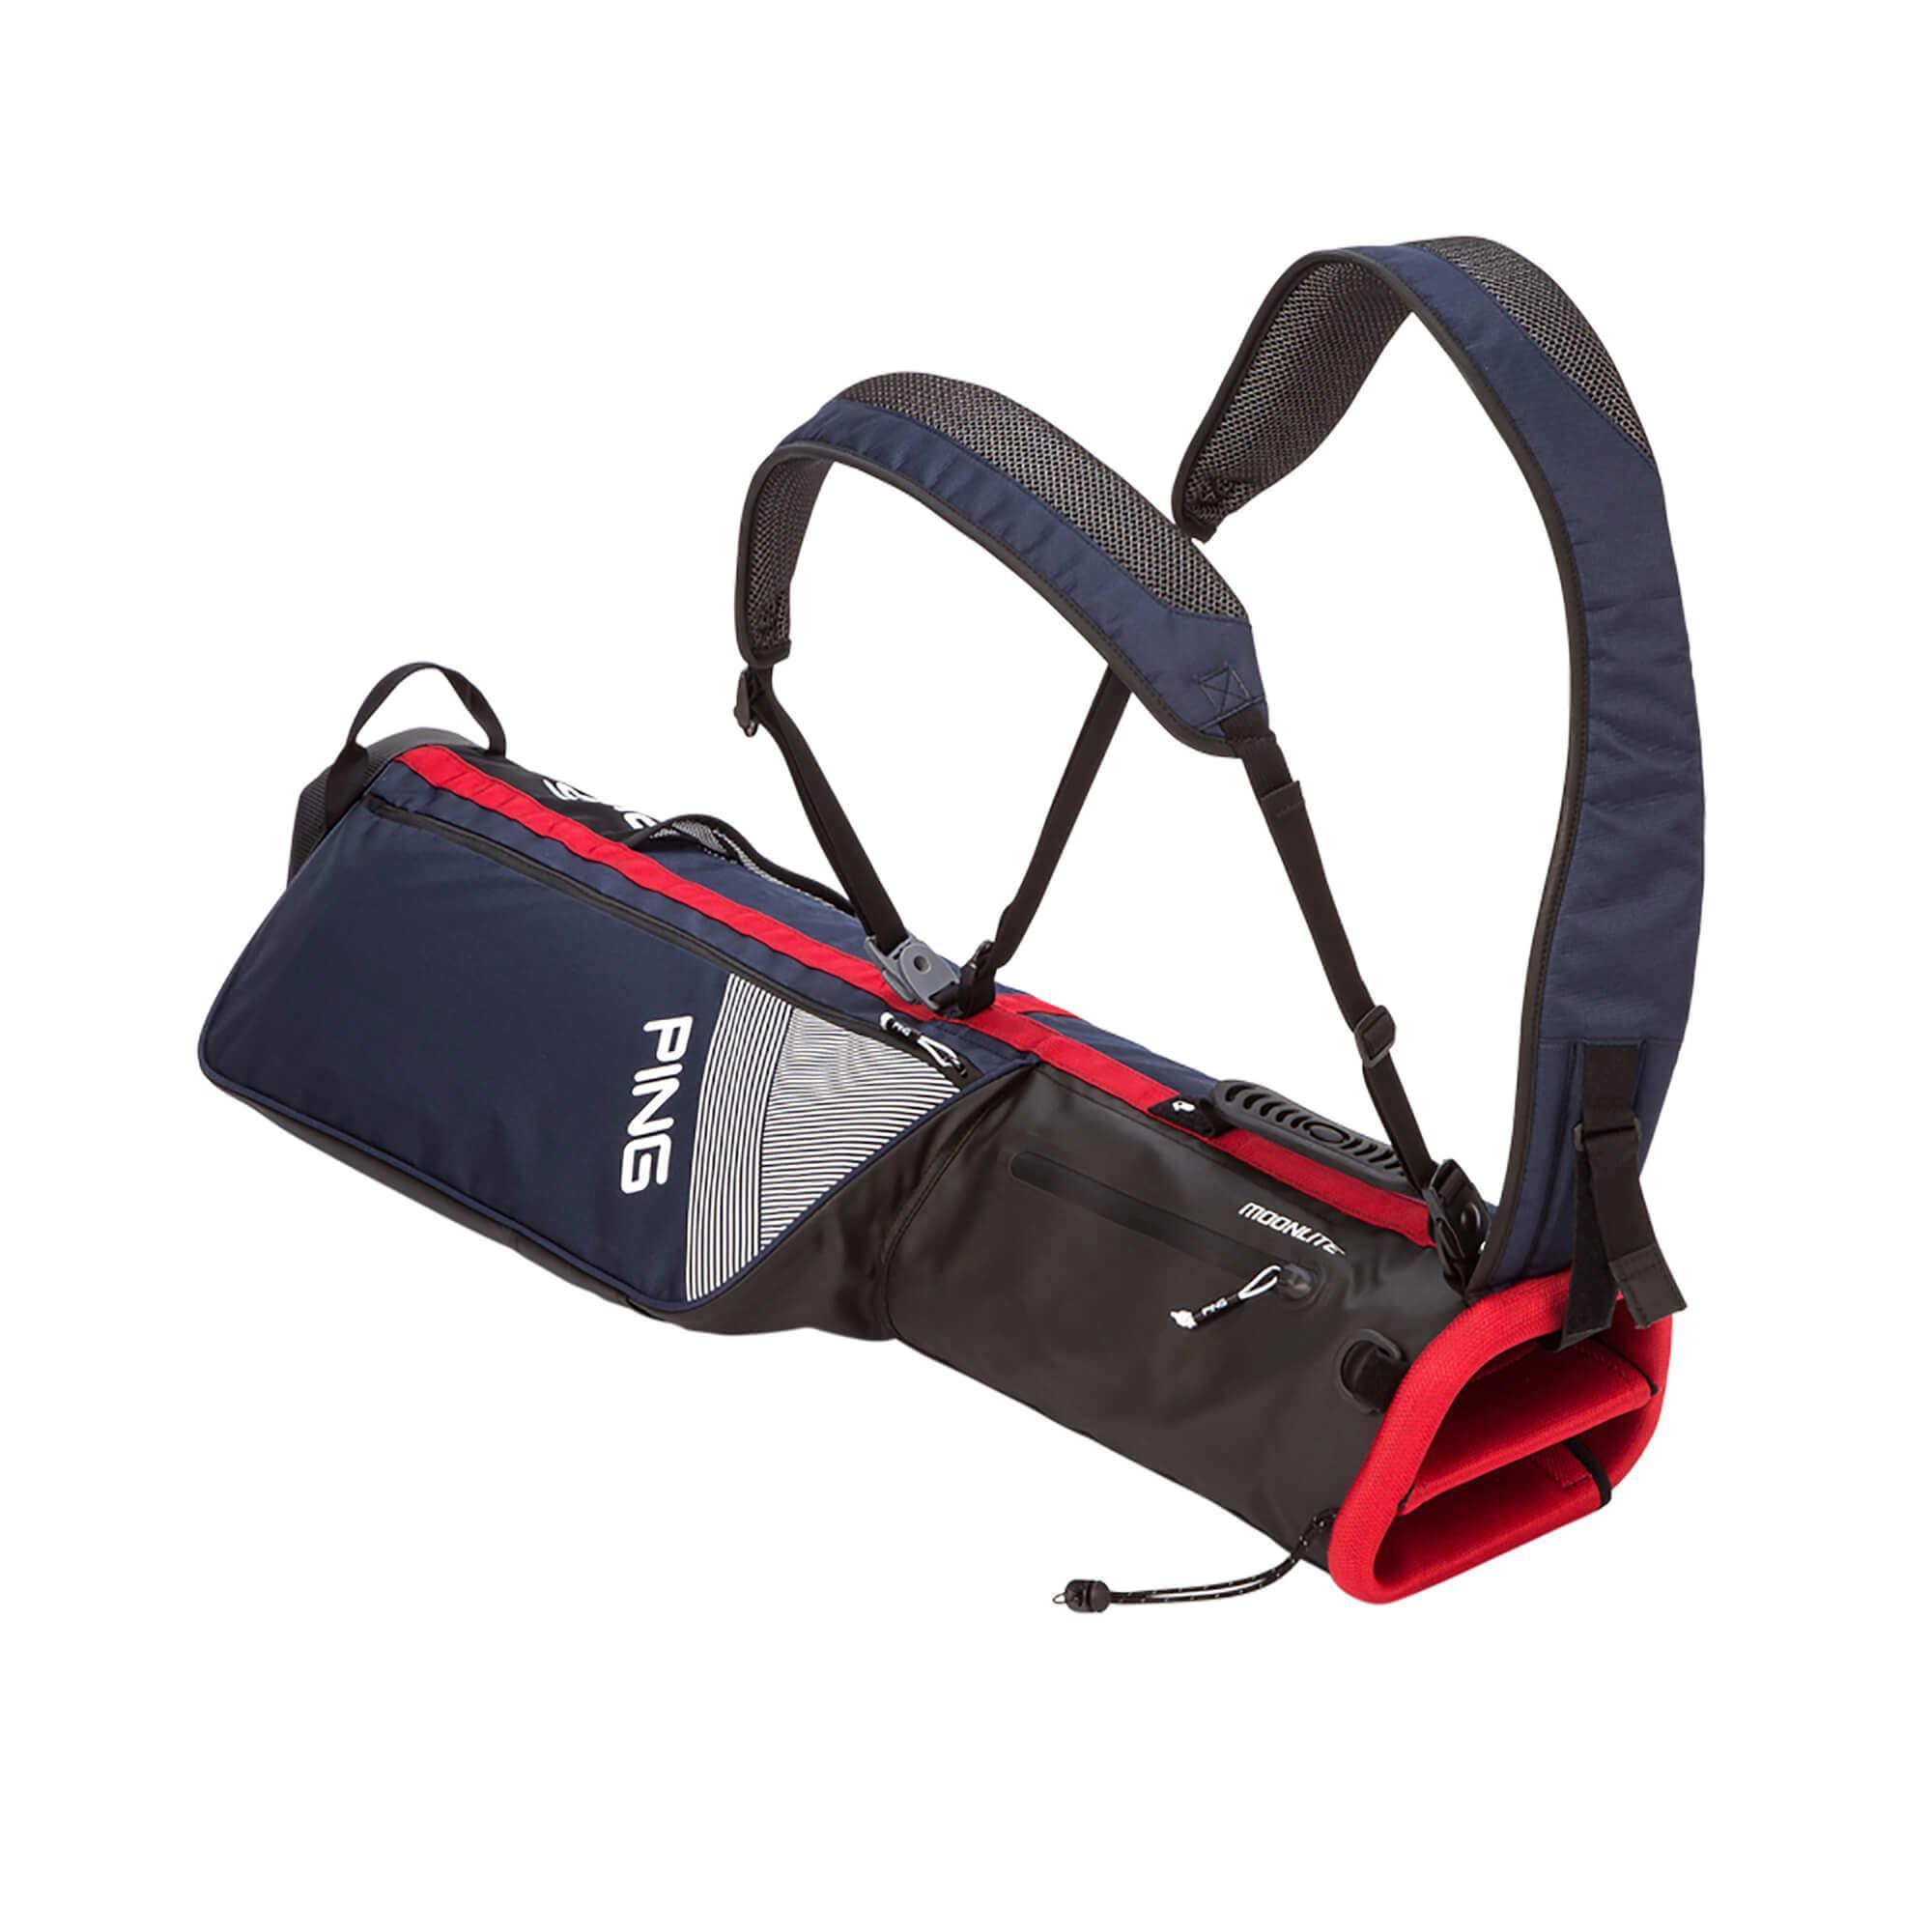 Ping Moon-Lite Bag 2007 | Discount Golf World  |Ping Moonlight Golf Bag